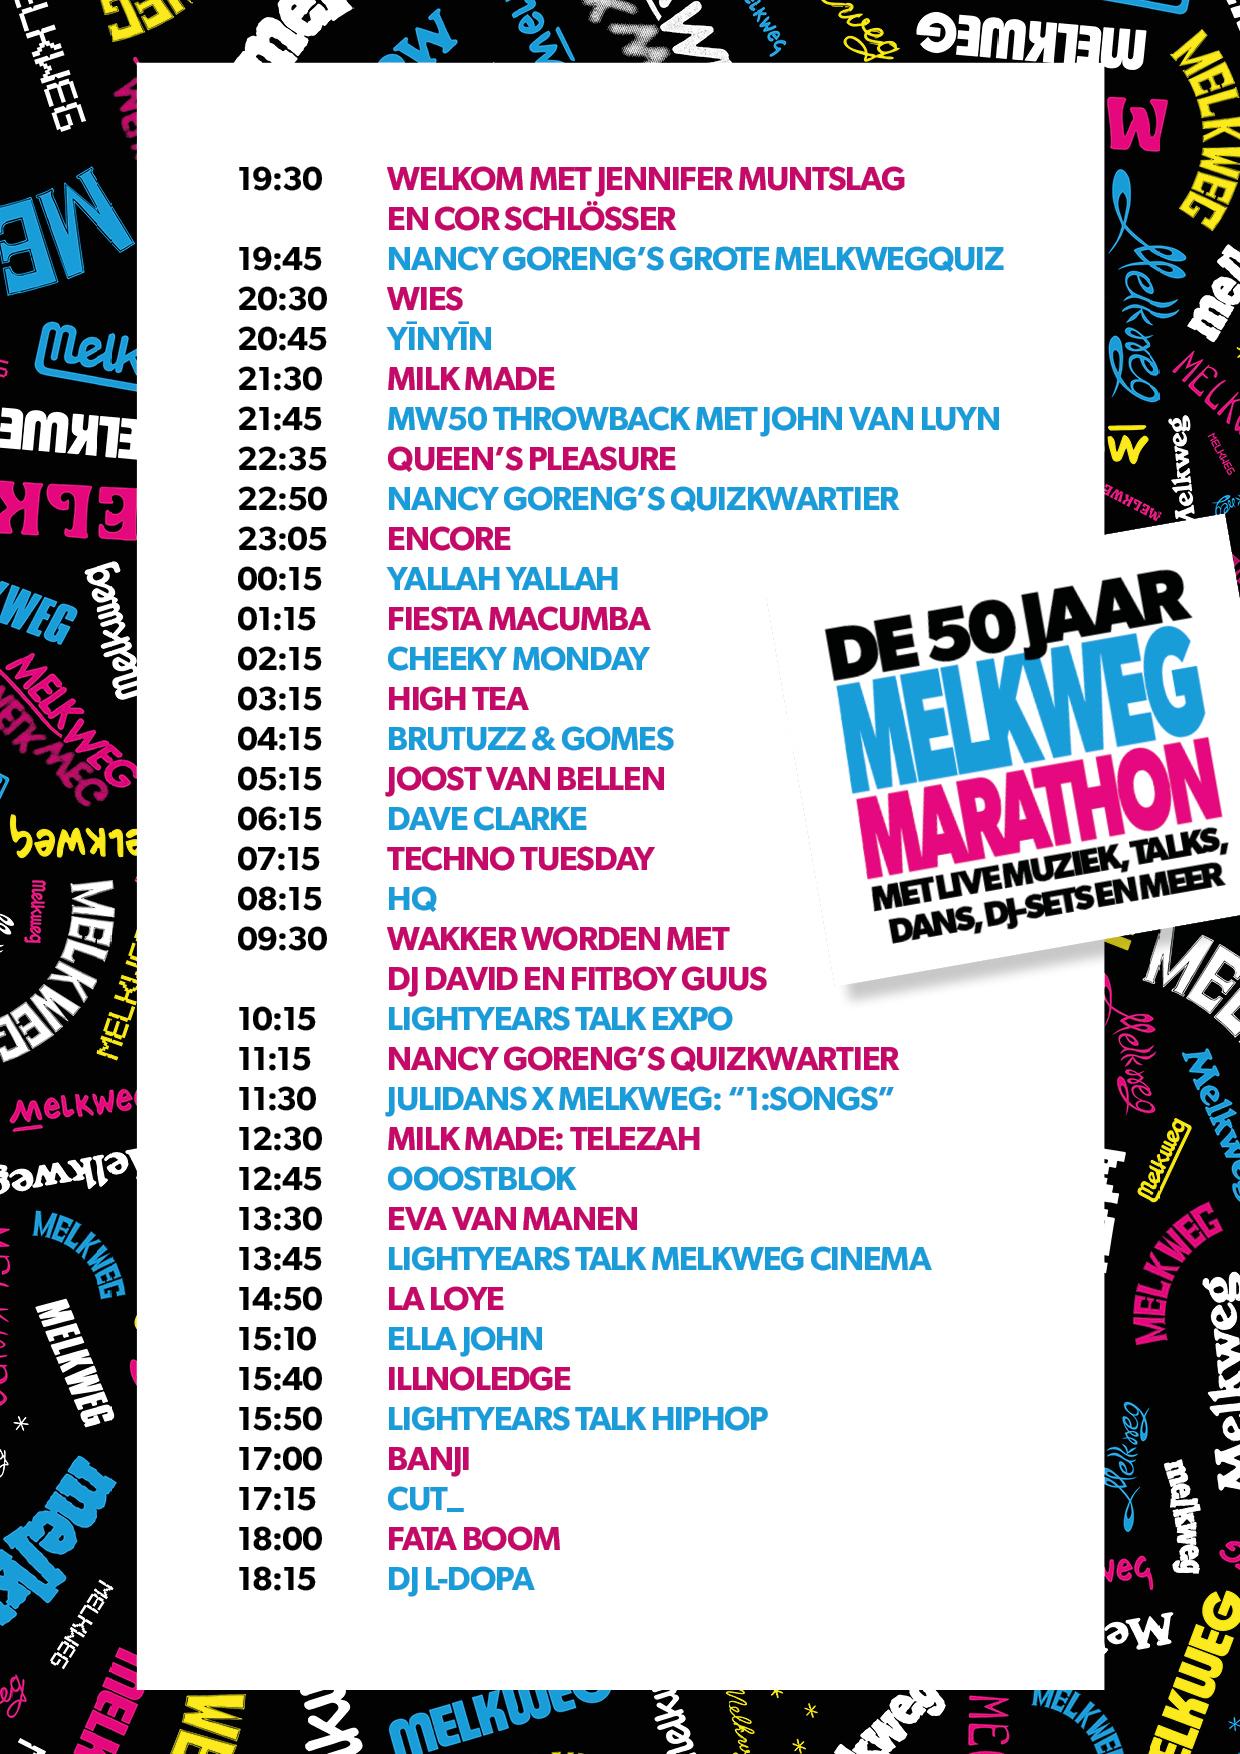 200717-mw-marathon--timetable-06.jpg